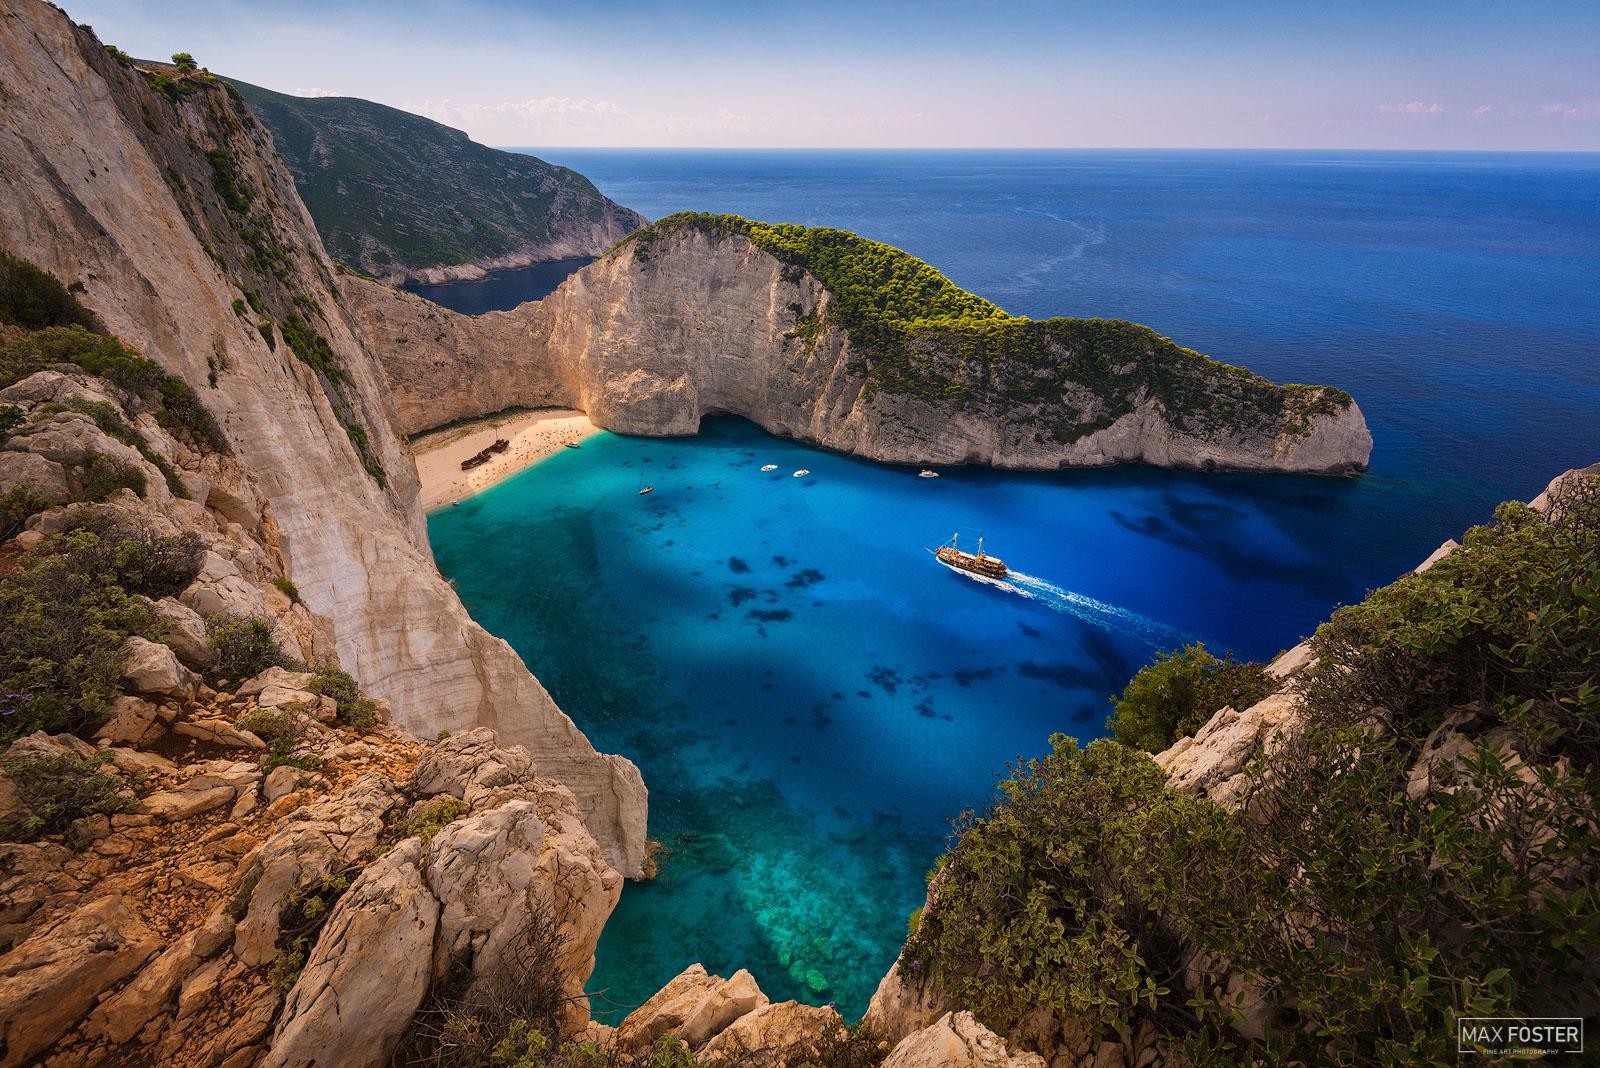 Shipwreck Beach, Zakynthos, Greece, Navagio Beach, Ionian Islands, Smugglers Cove, photo